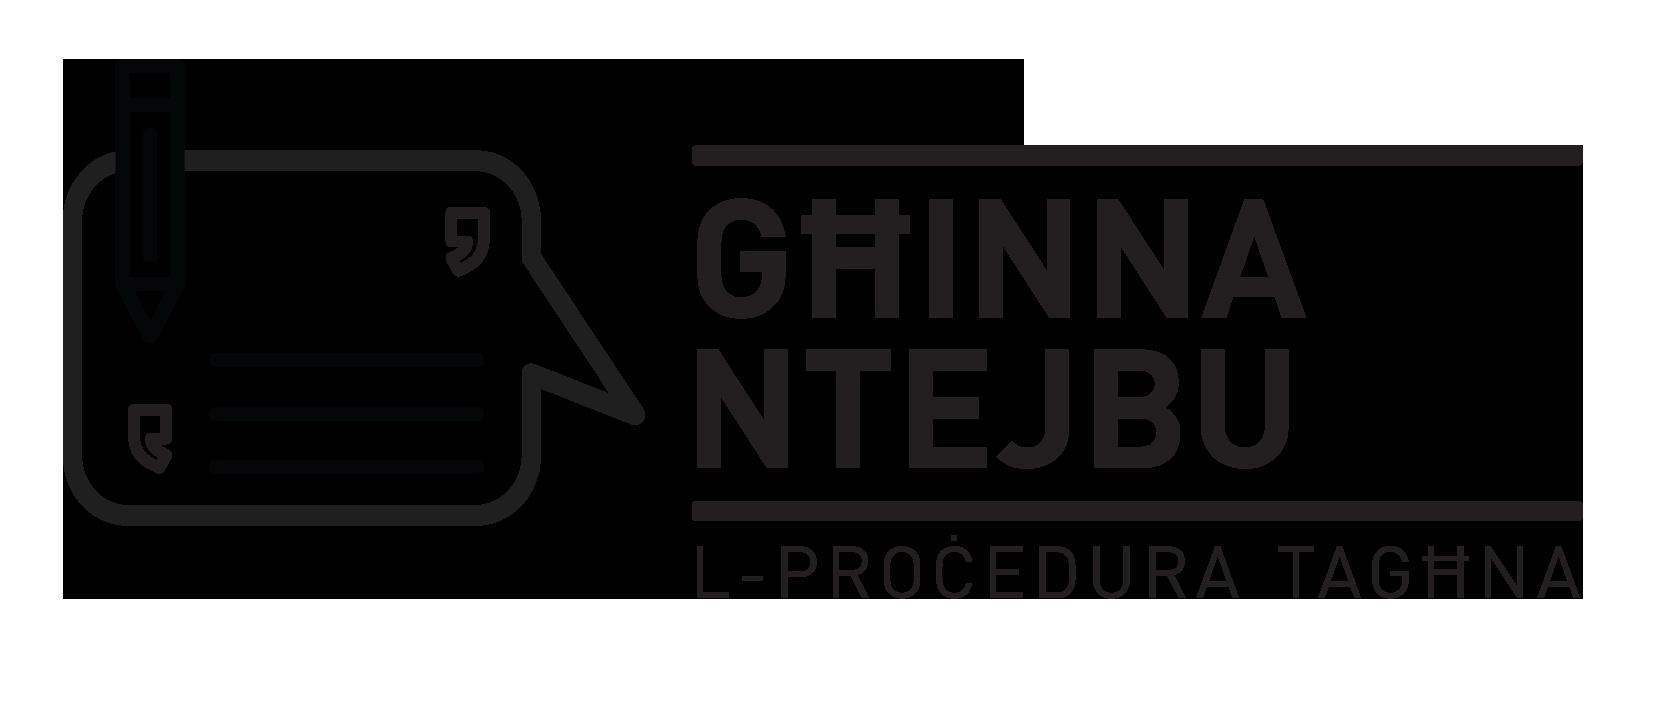 Help us improve our procedure